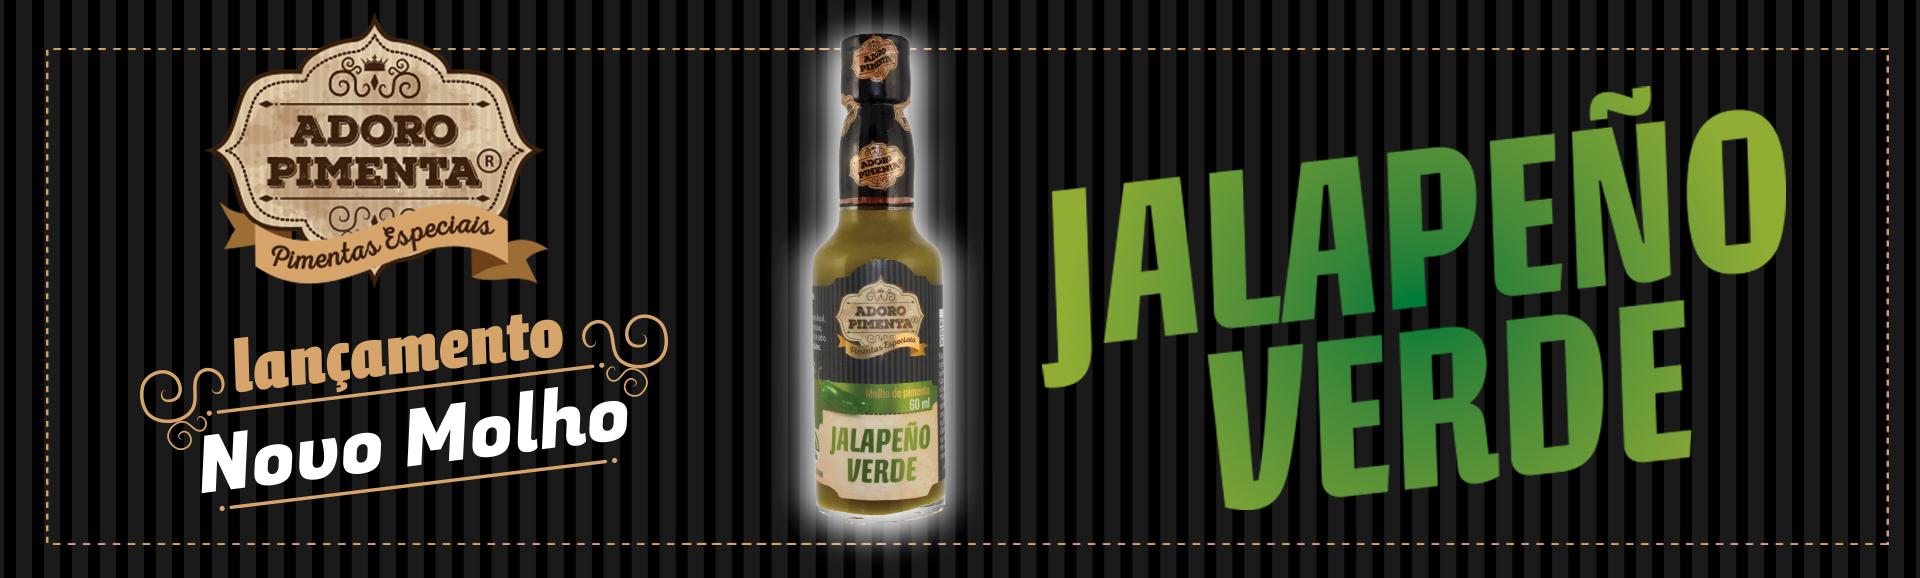 banner-molhos-jalapeno-verde